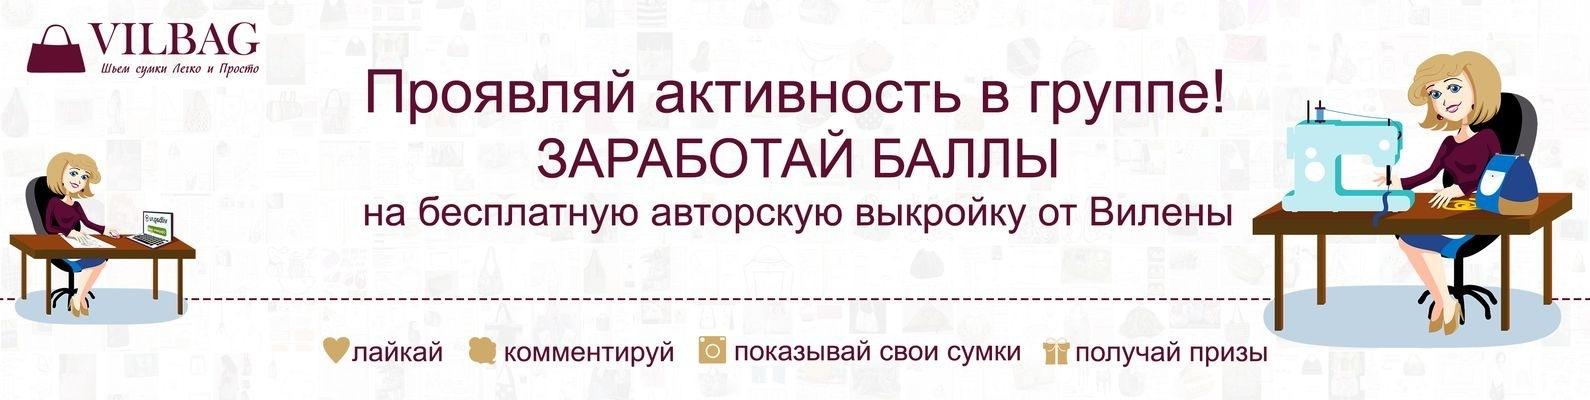 6a1910eaa2ce Шьем сумки Легко и Просто - МК - Выкройки | ВКонтакте